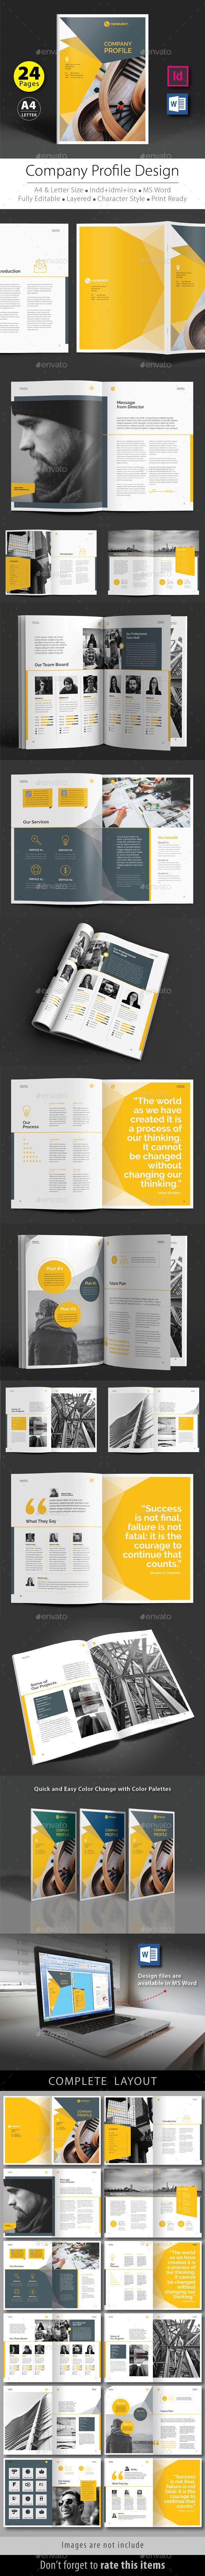 pany Profile Design Template V 6 Corporate Brochures